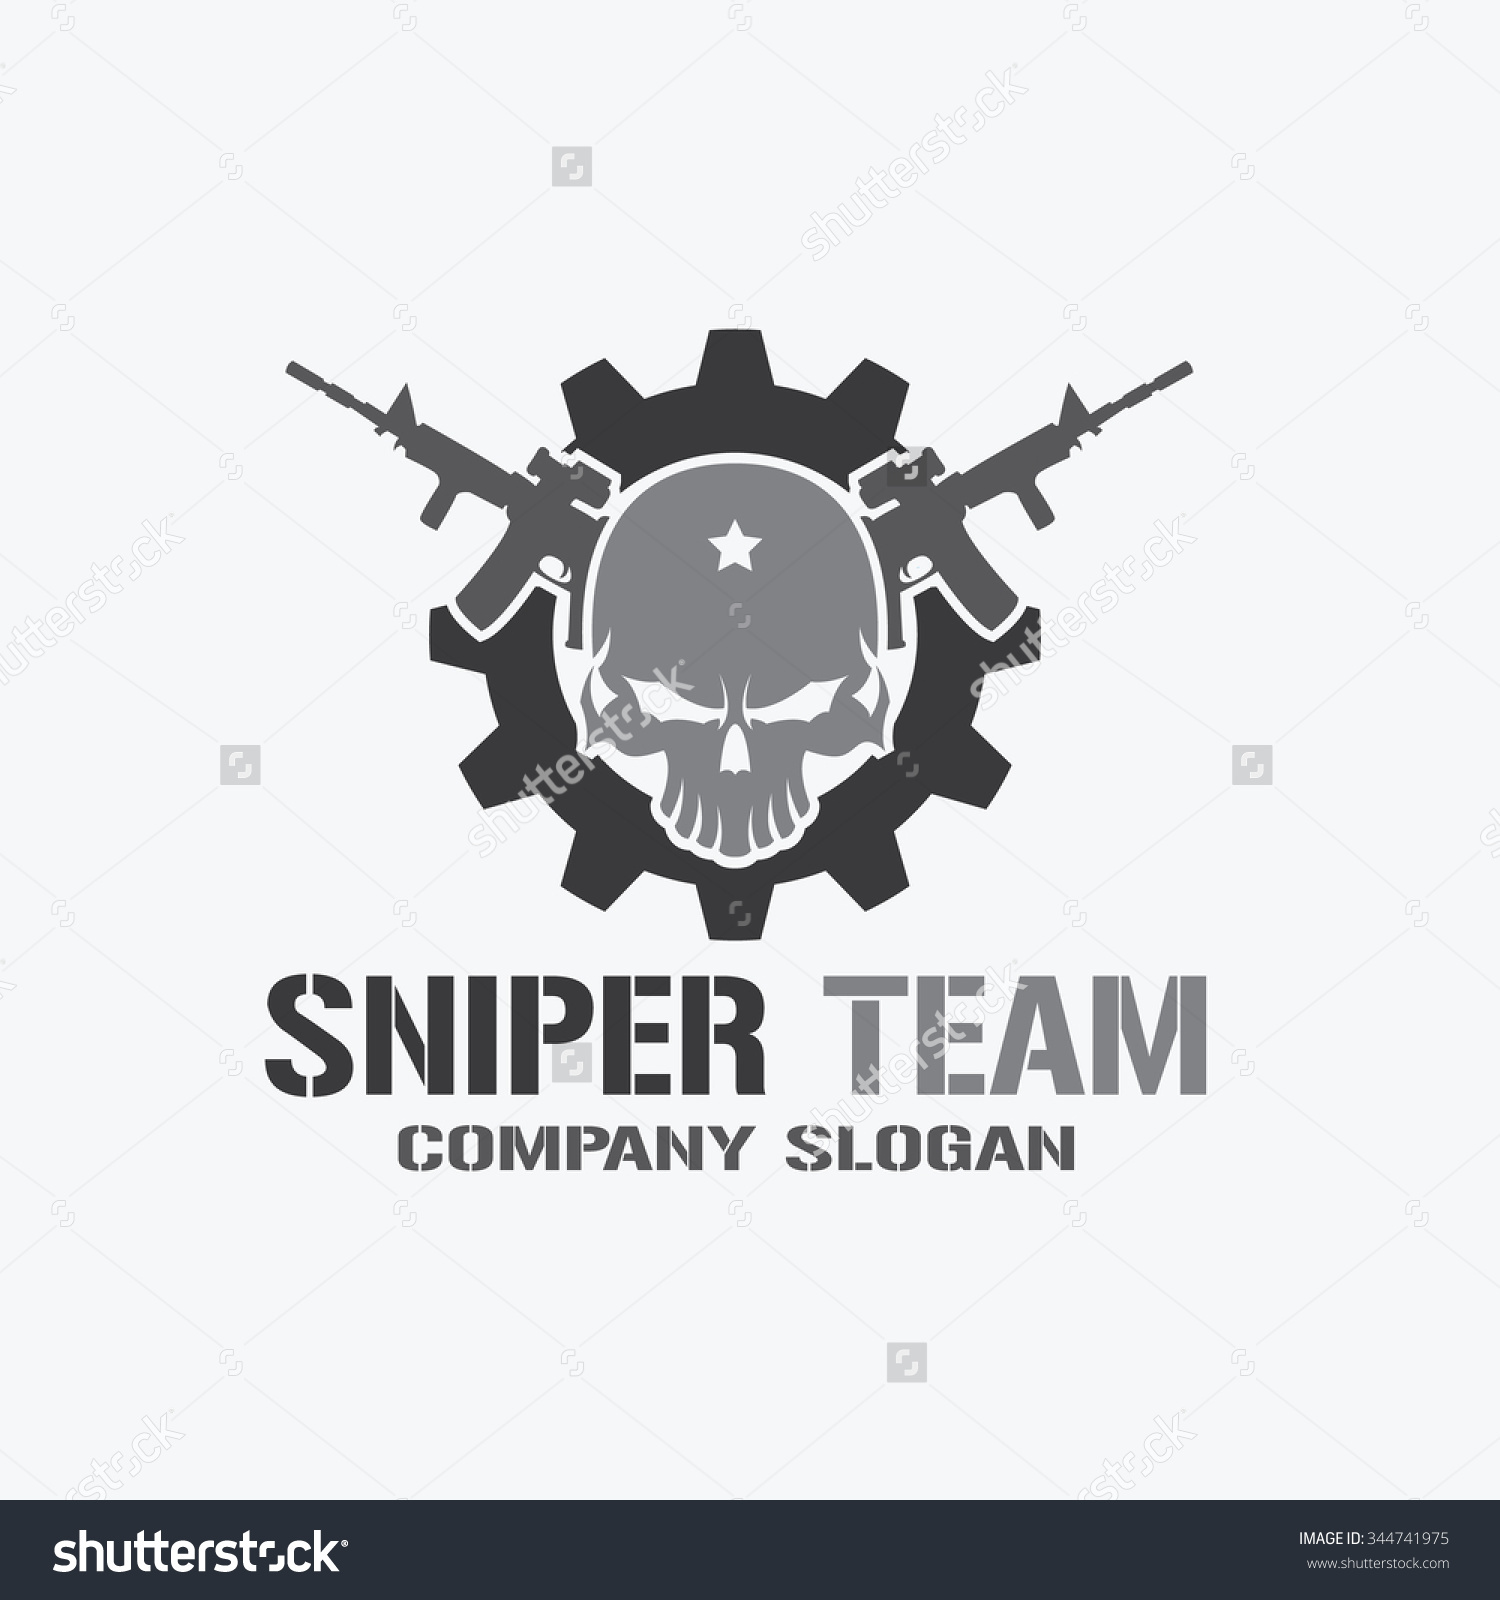 Snipers clipart skull Snipers ideas Pinterest Gaming Skousen